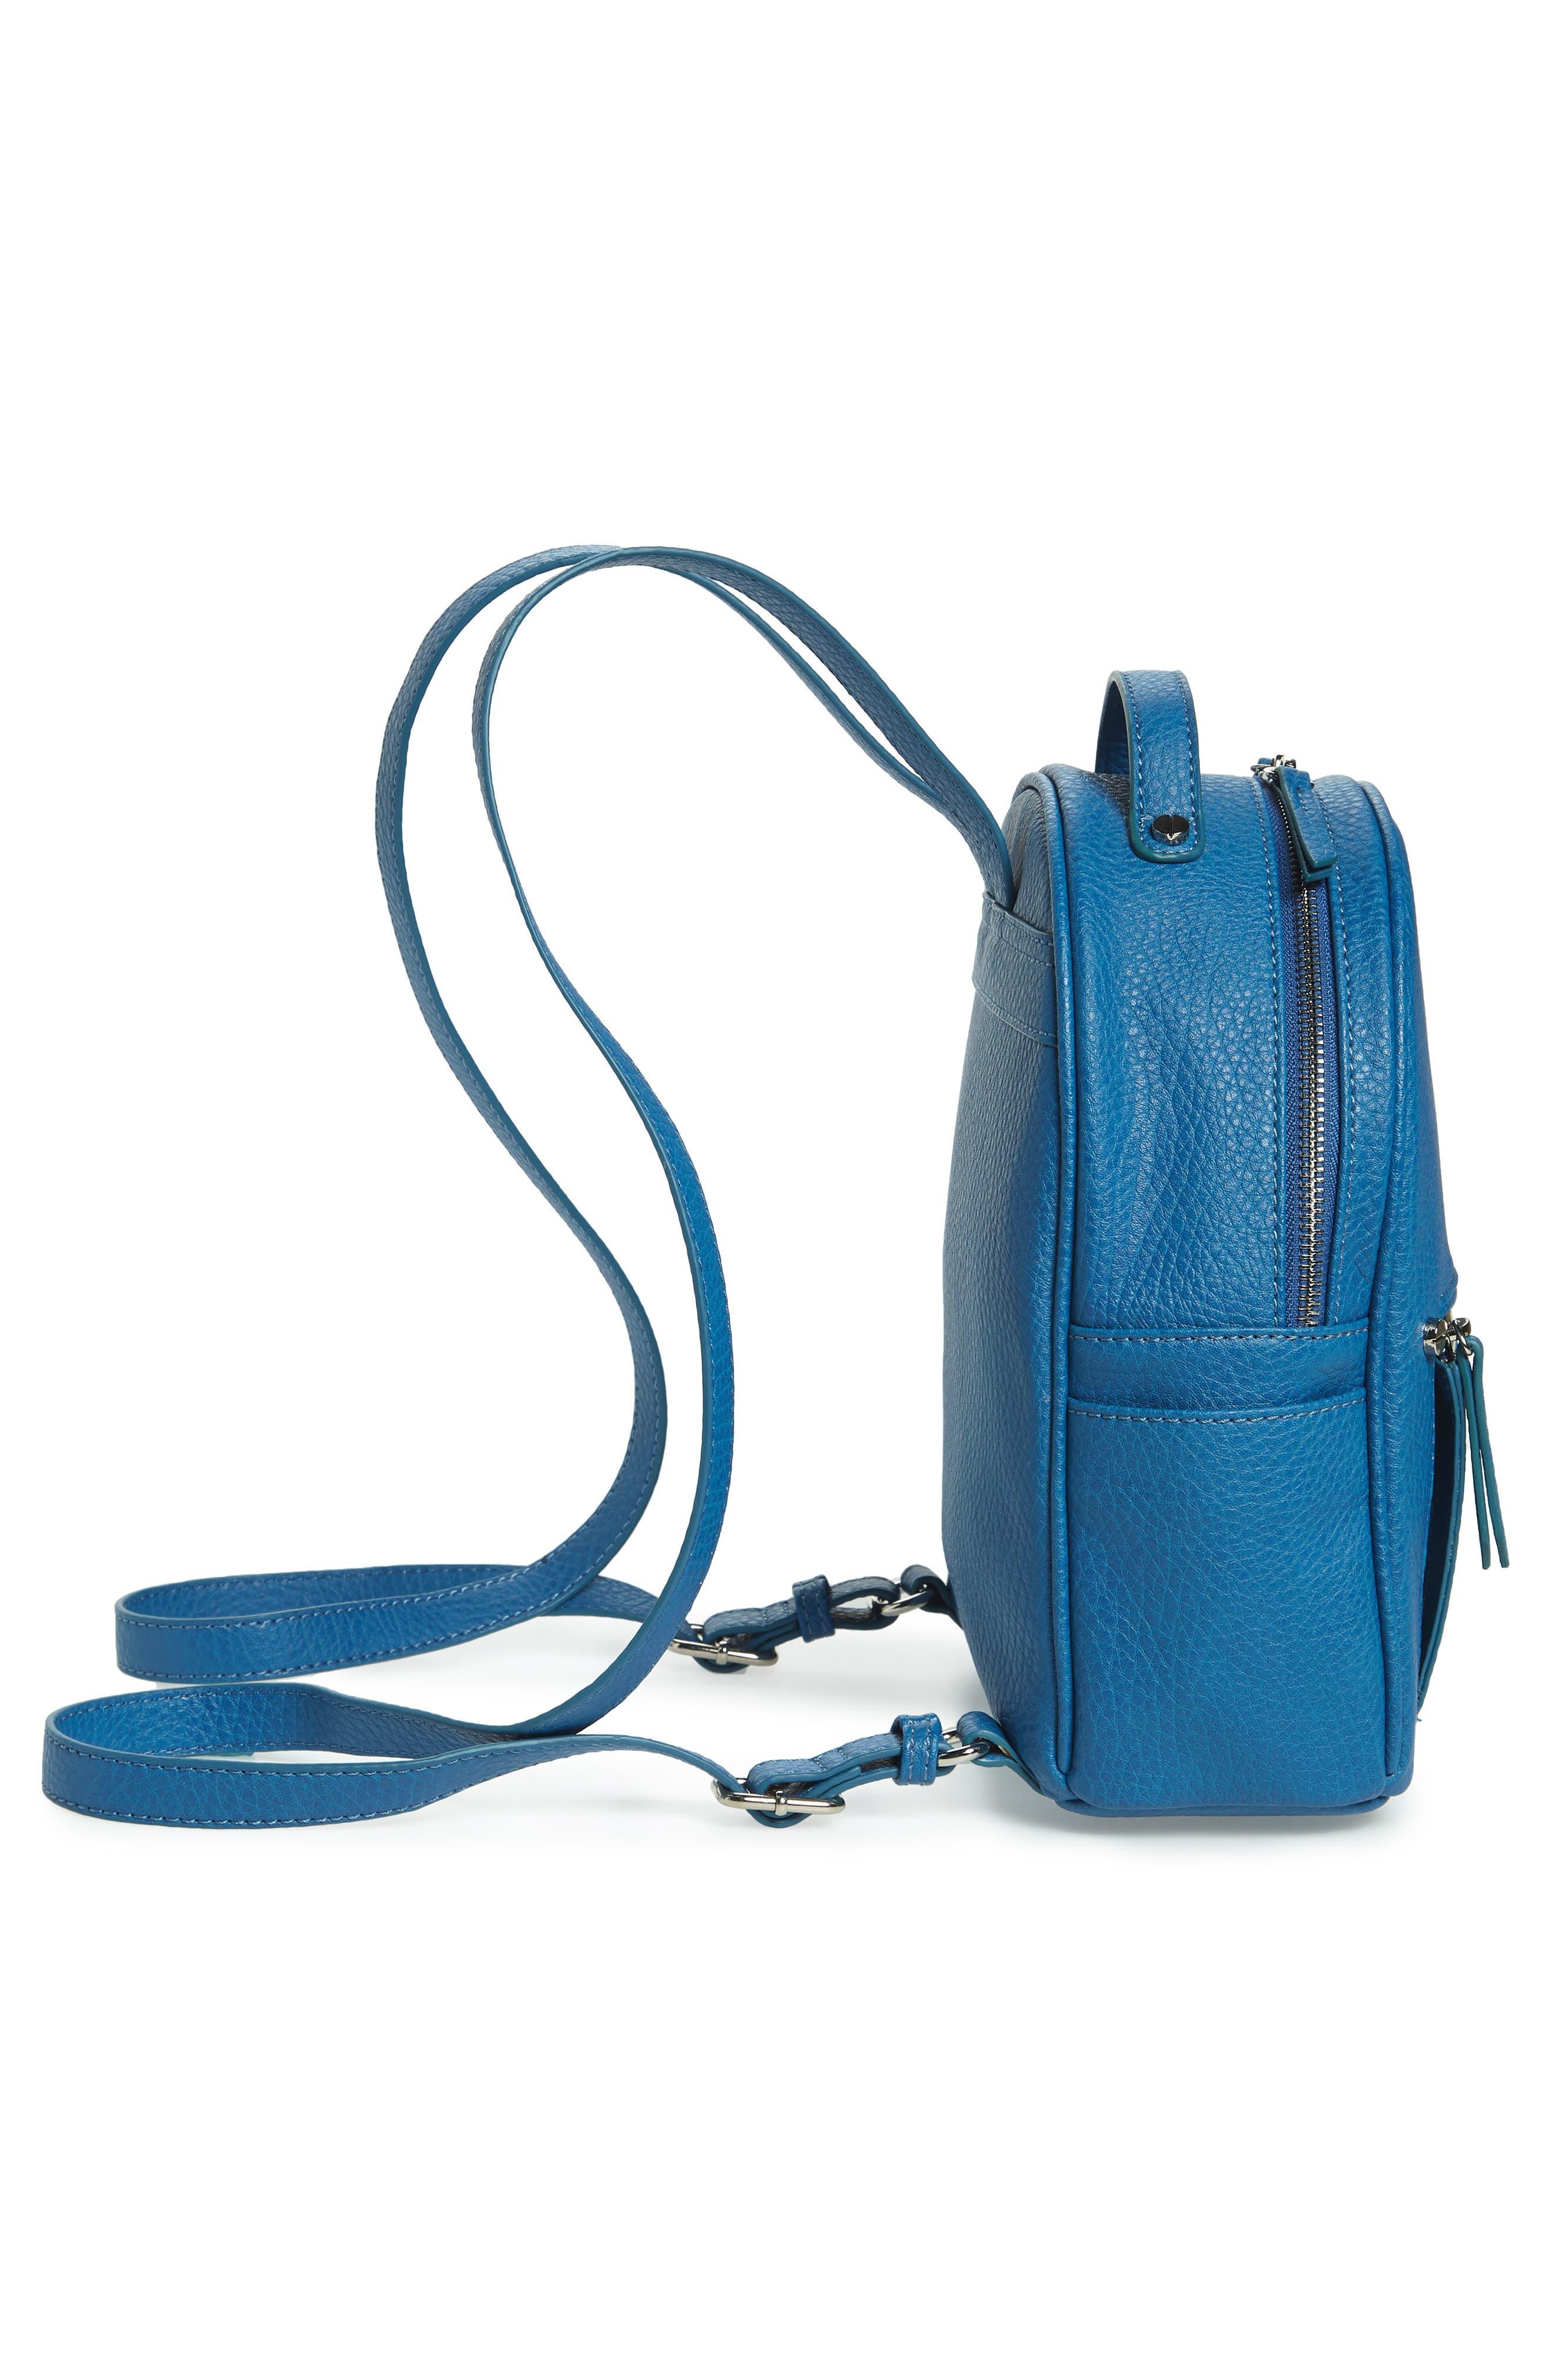 Mali + Lili Hannah Vegan Leather Backpack,                             Alternate thumbnail 5, color,                             FRENCH BLUE